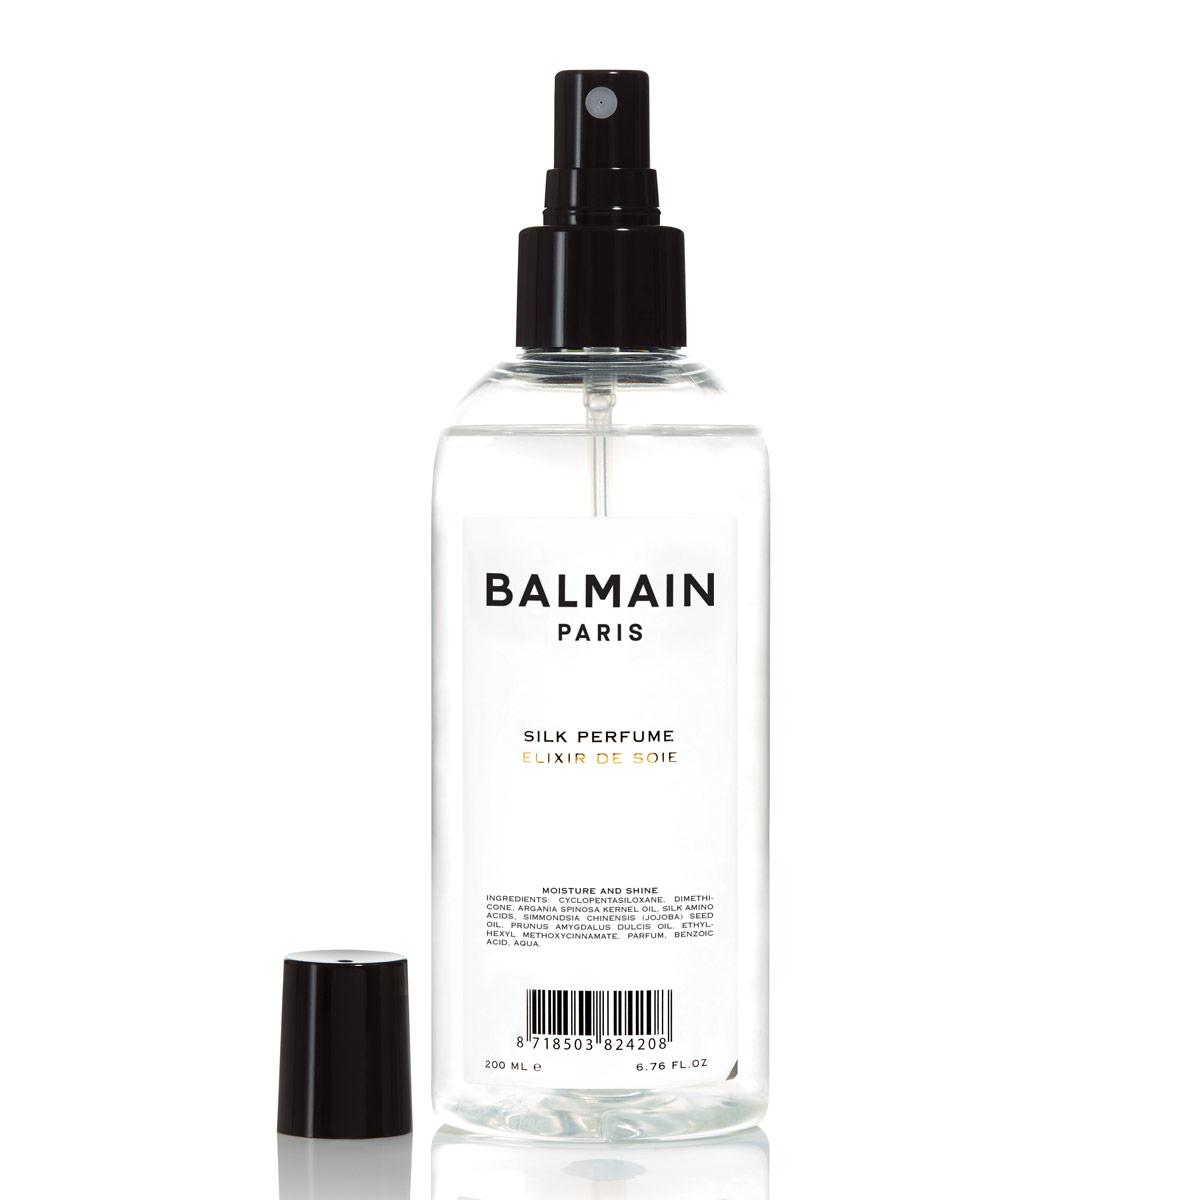 Balmain Silk Perfume 200 ml